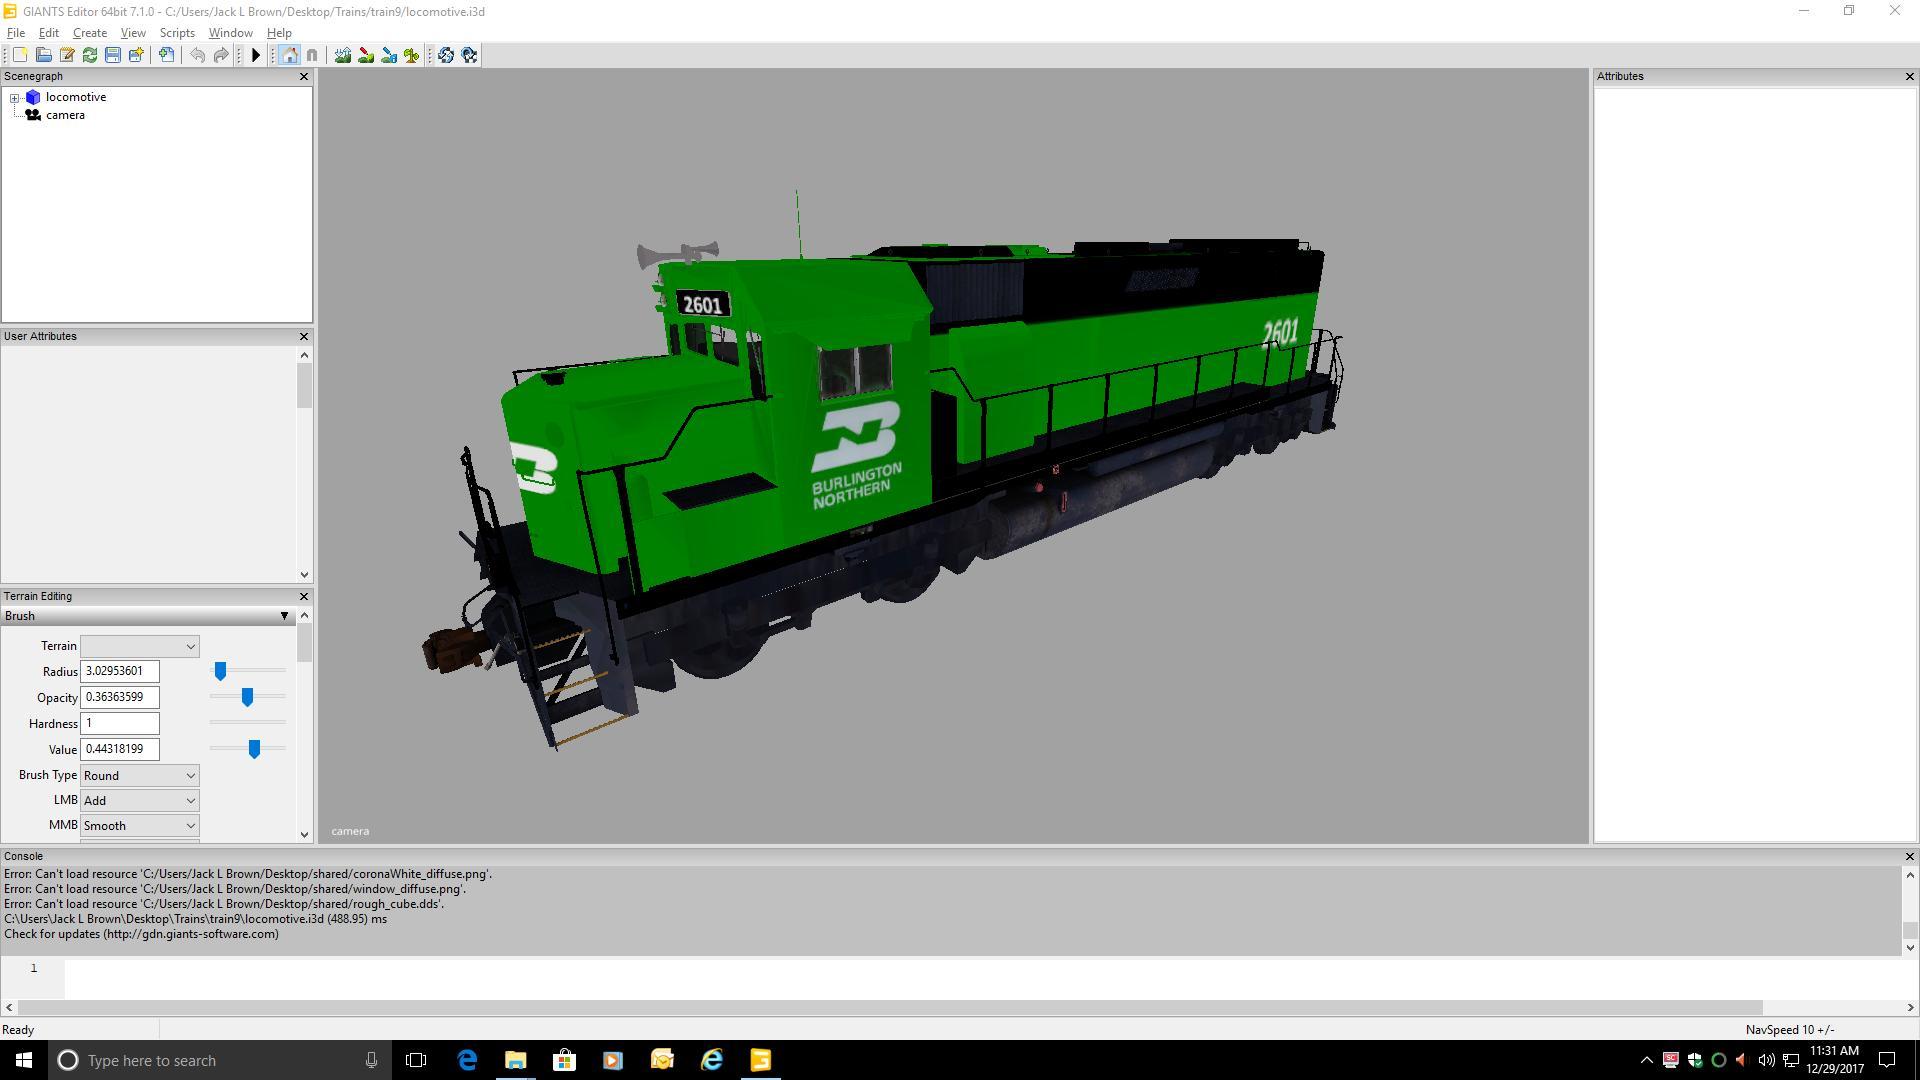 TRAINS MODS V1 0 0 0 FS17 - Farming Simulator 17 mod / FS 2017 mod